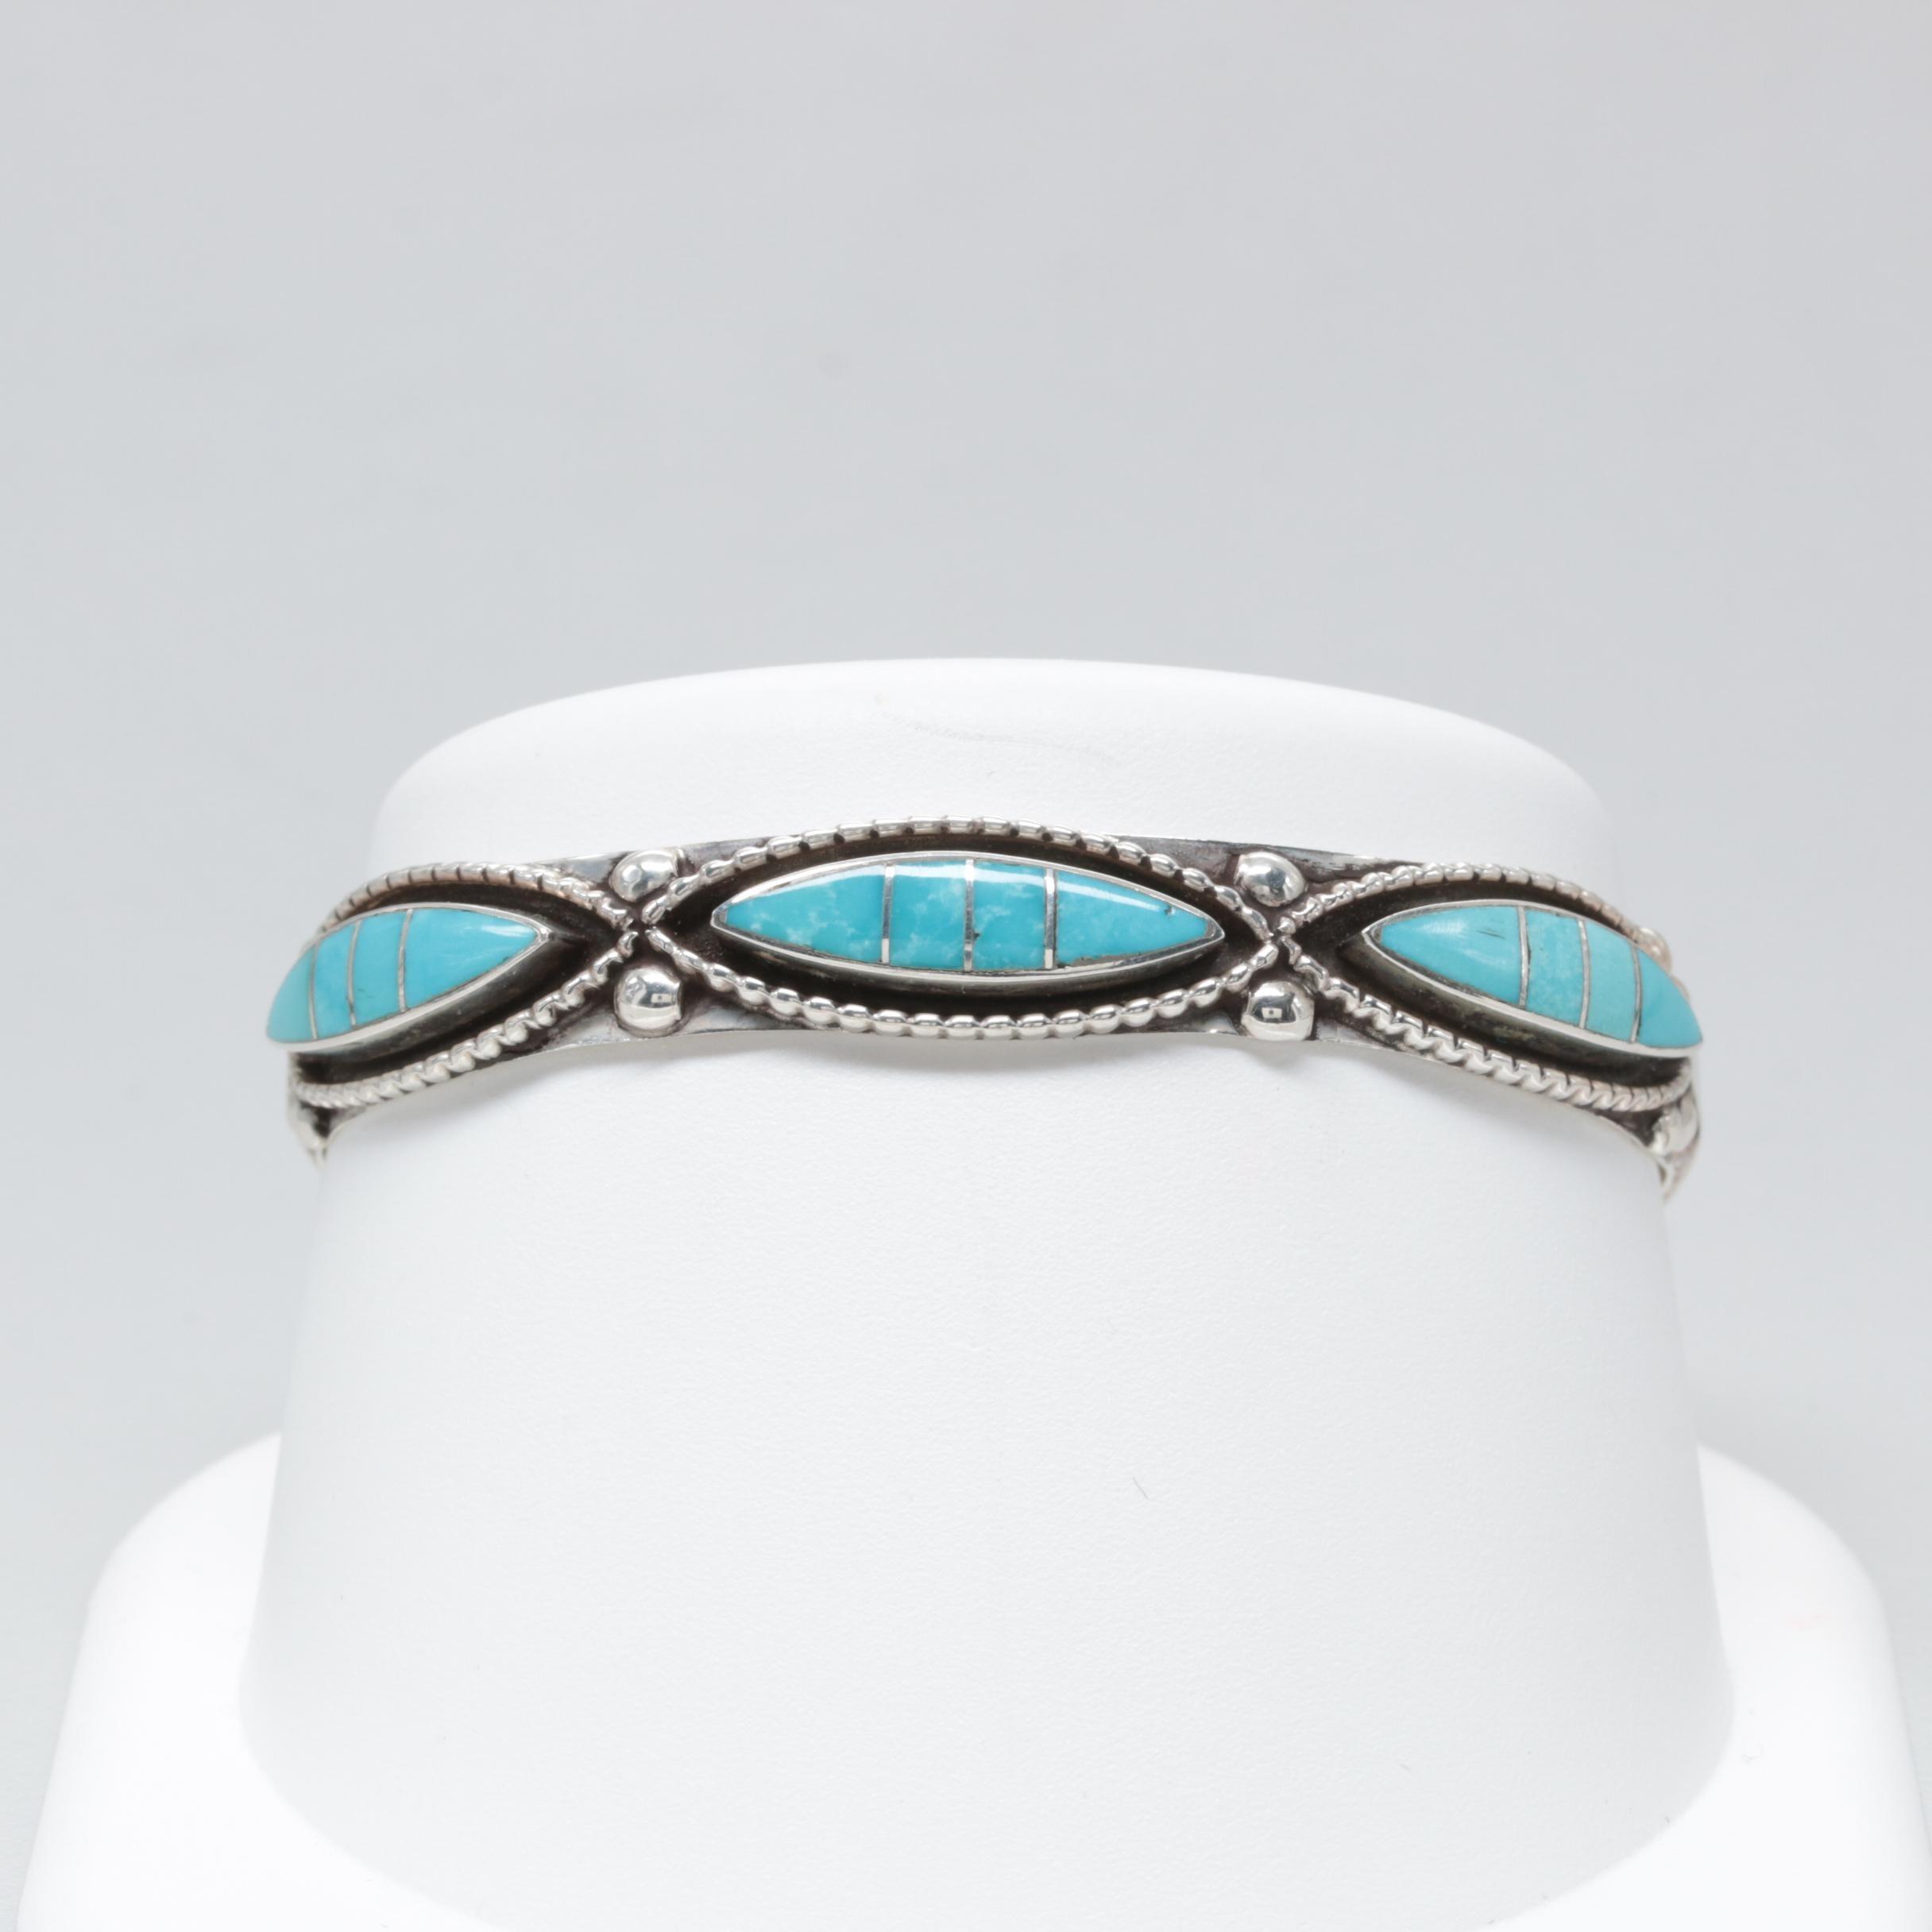 LLoyd Salvador Zuni Sterling Silver Turquoise Cuff Bracelet